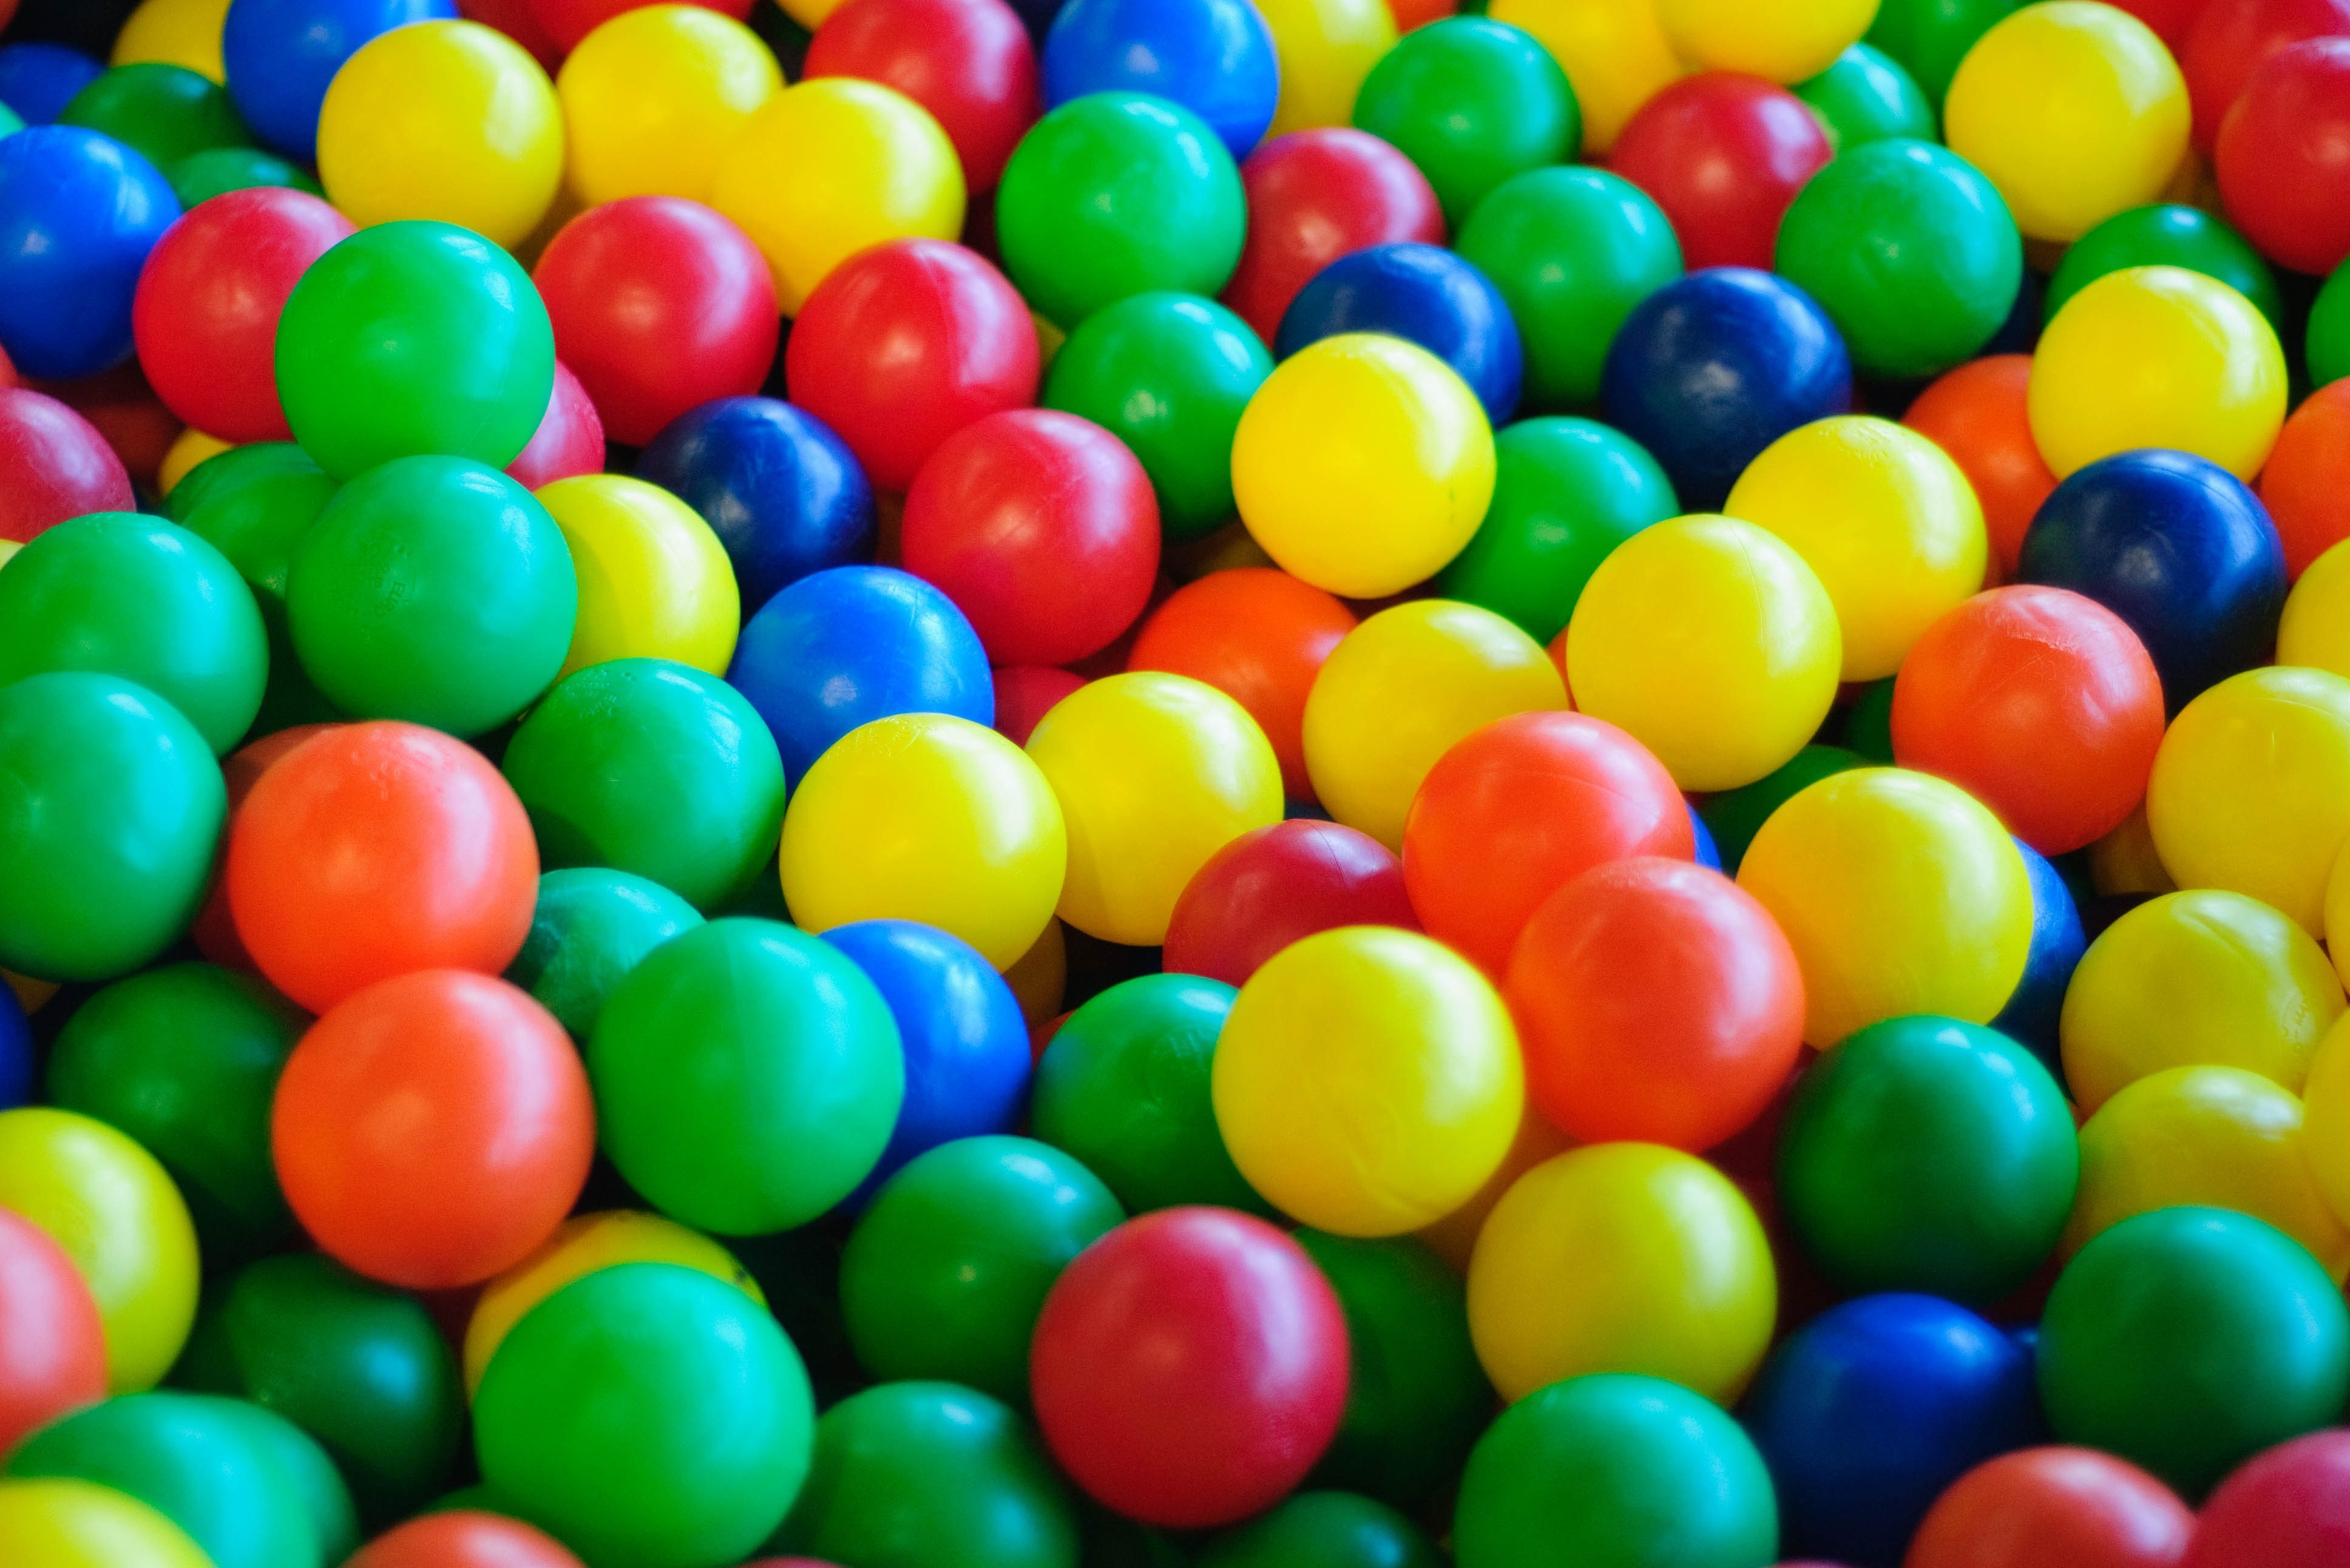 Soft-play ball pit